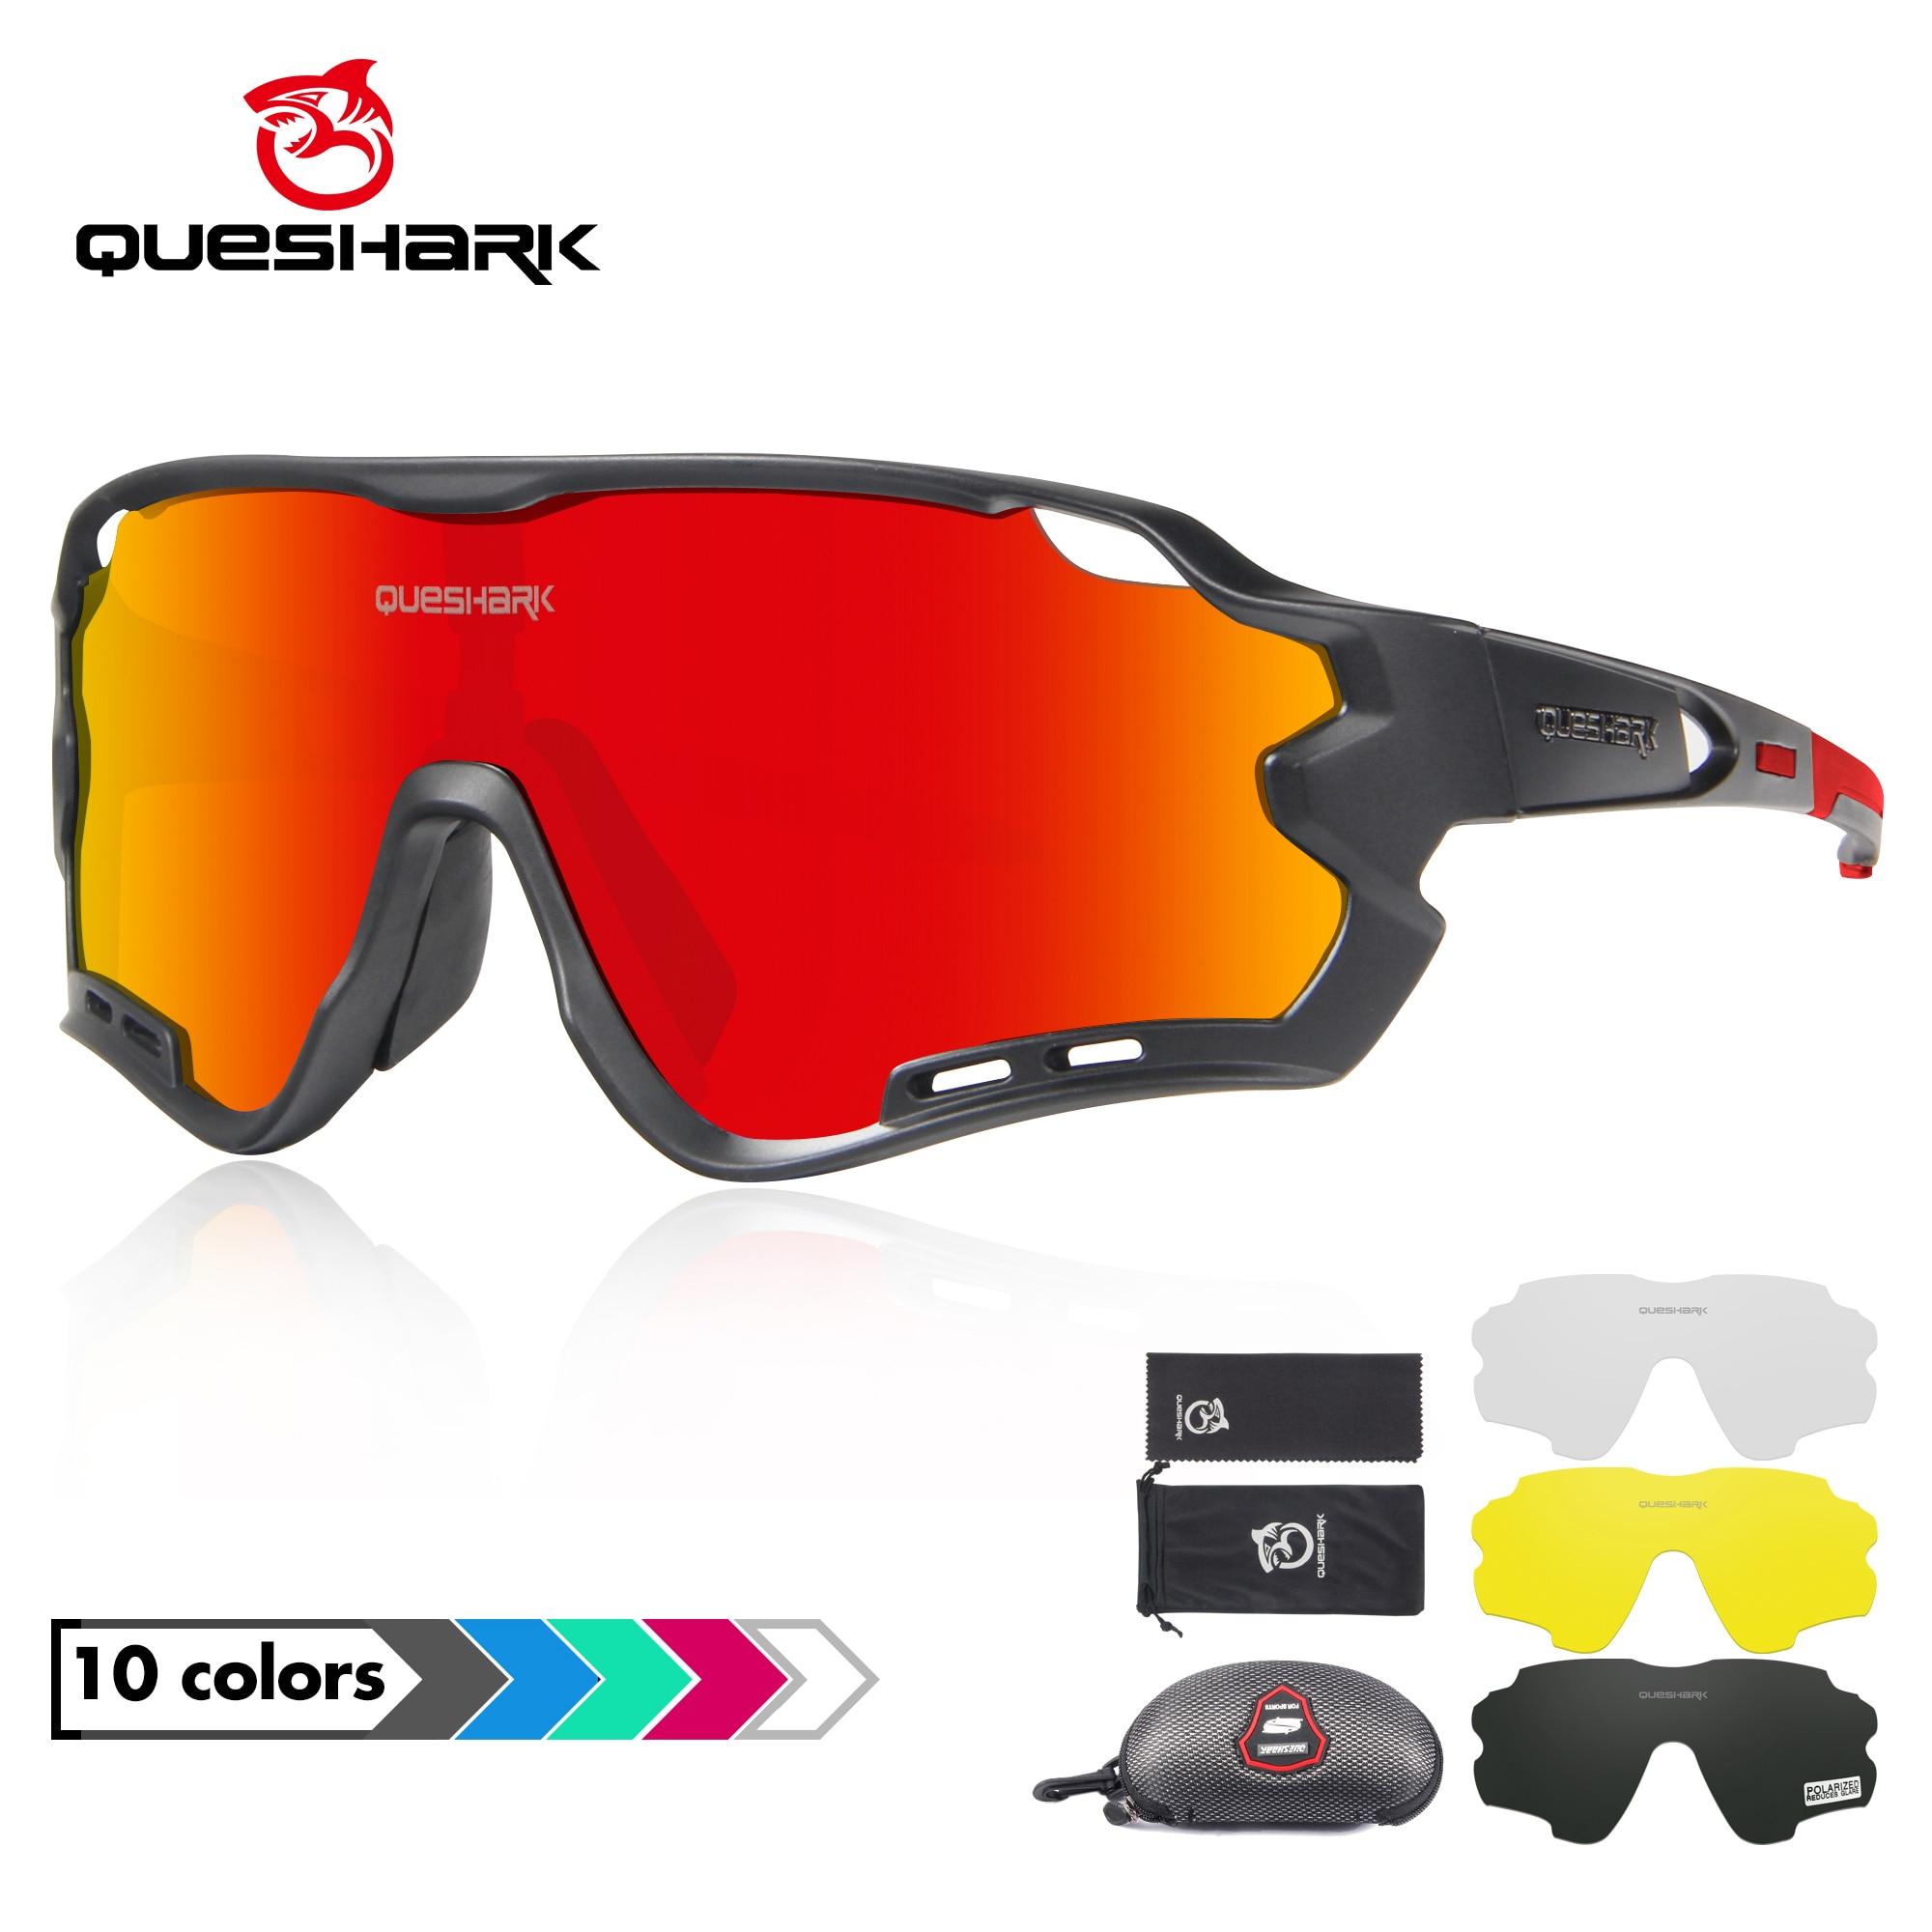 QUESHARK 4 Lens Cycling Glasses Bicycle Goggles for Men Women Polarized Cycling Eyewear UV400 Road MTB Bike Sunglasses QE44 1